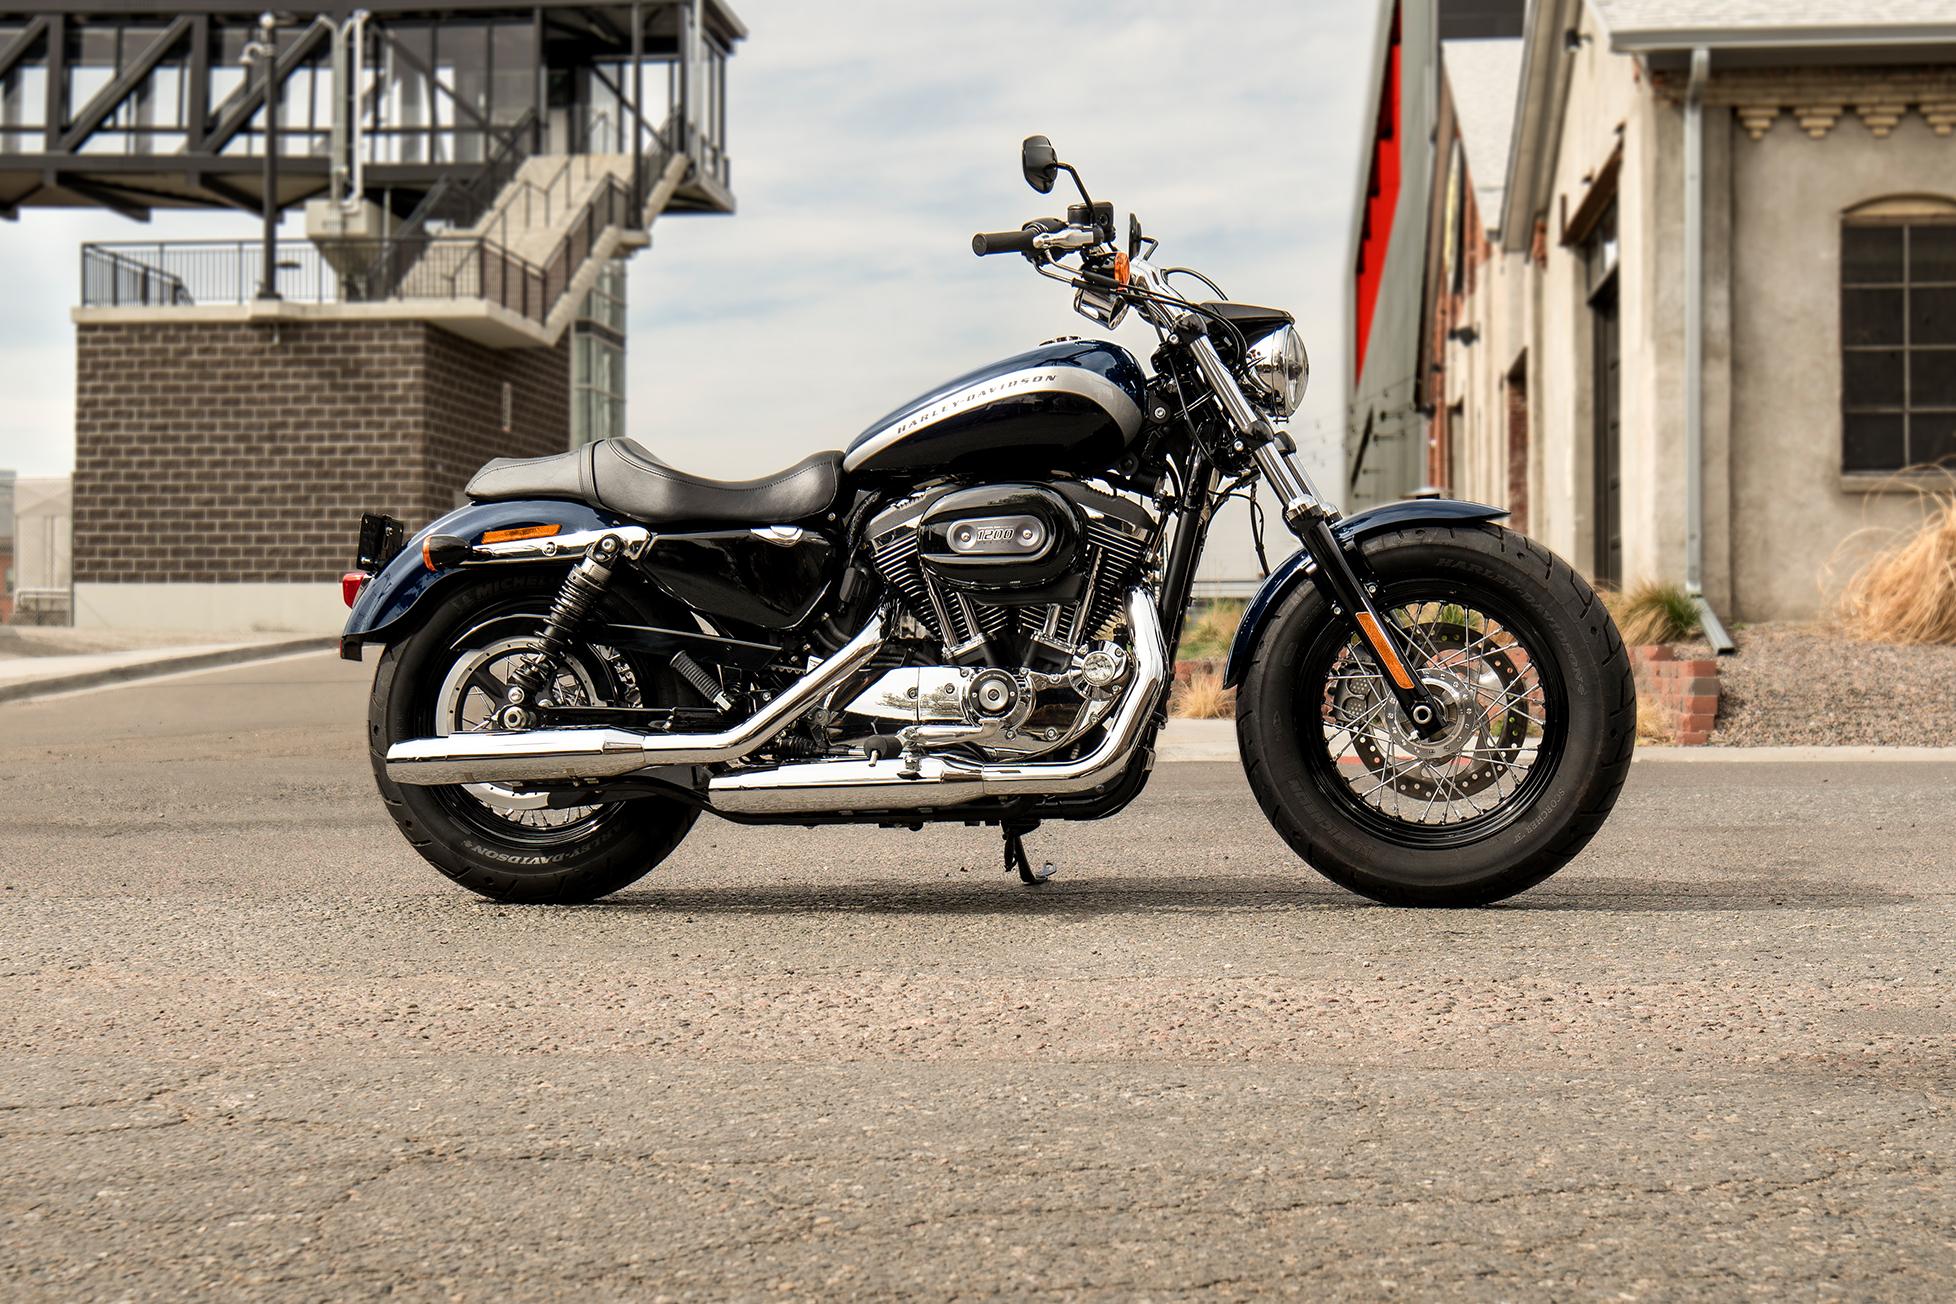 2020 1200 custom motorcycle harley davidson australia new zealand. Black Bedroom Furniture Sets. Home Design Ideas